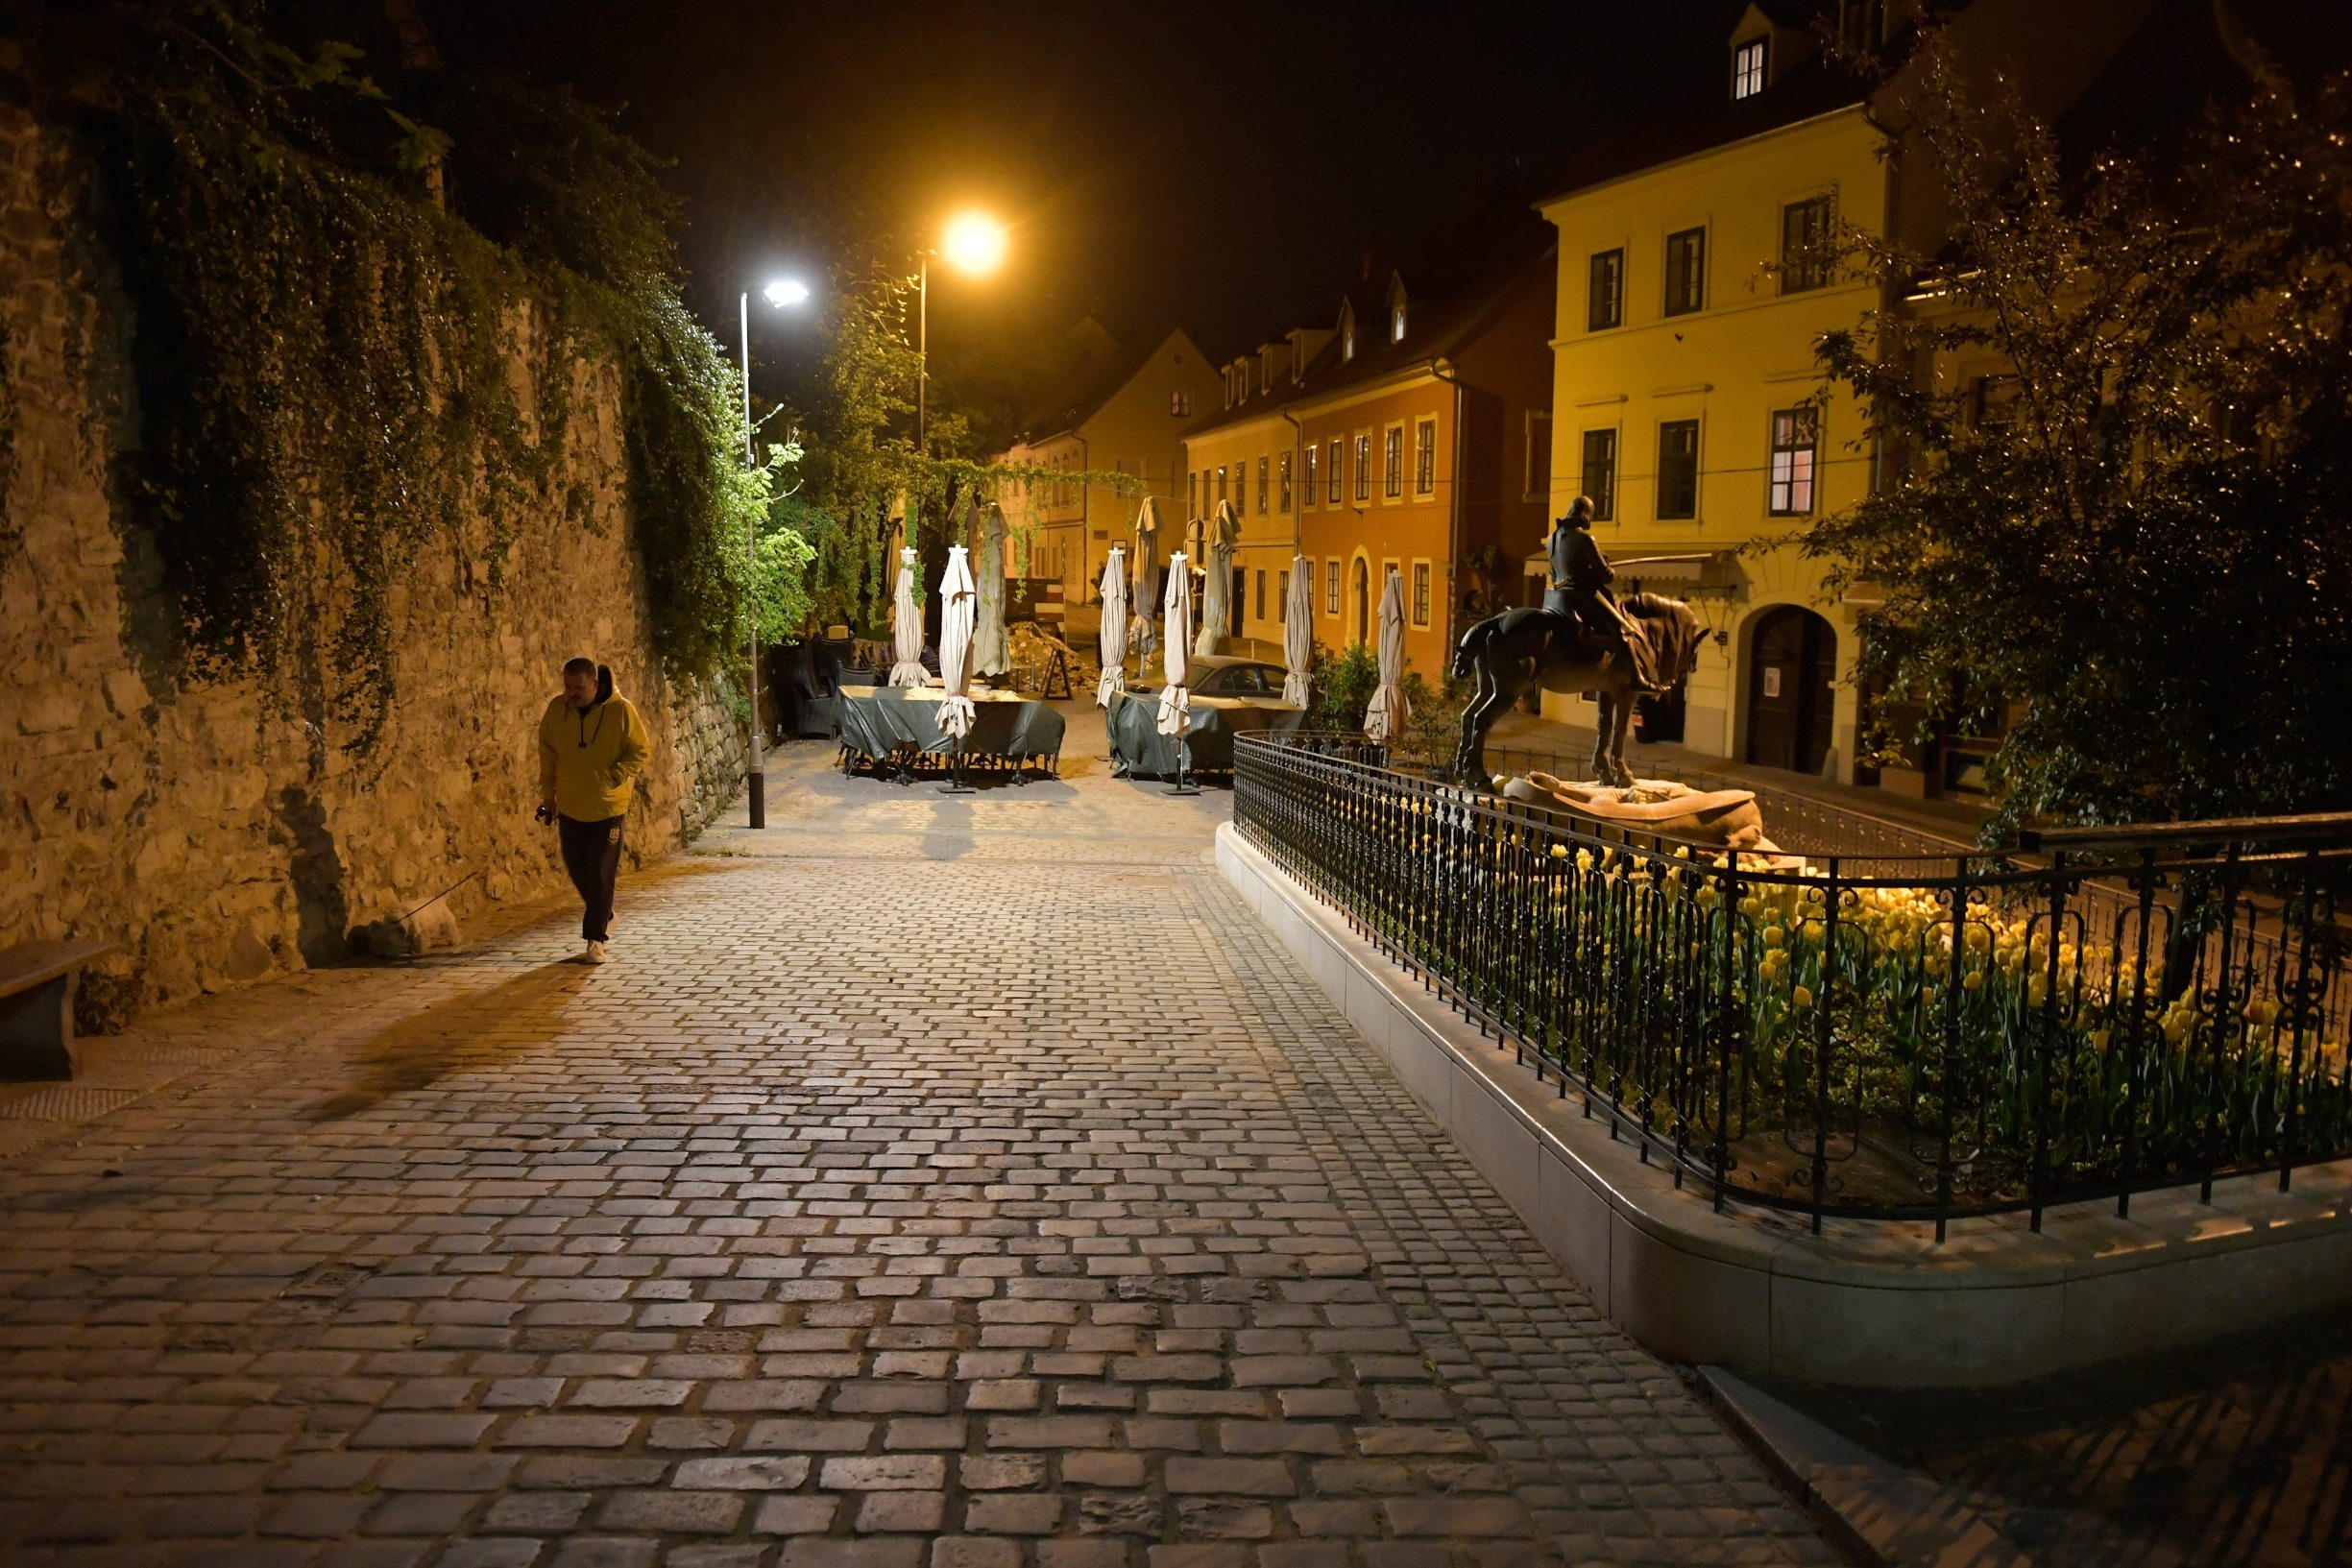 Zagreb, 220420. Kamenita vrata. Nocna reportaza o atmosferi u centru grada za vrijeme pandemije virusa. Foto: Goran Mehkek / CROPIX